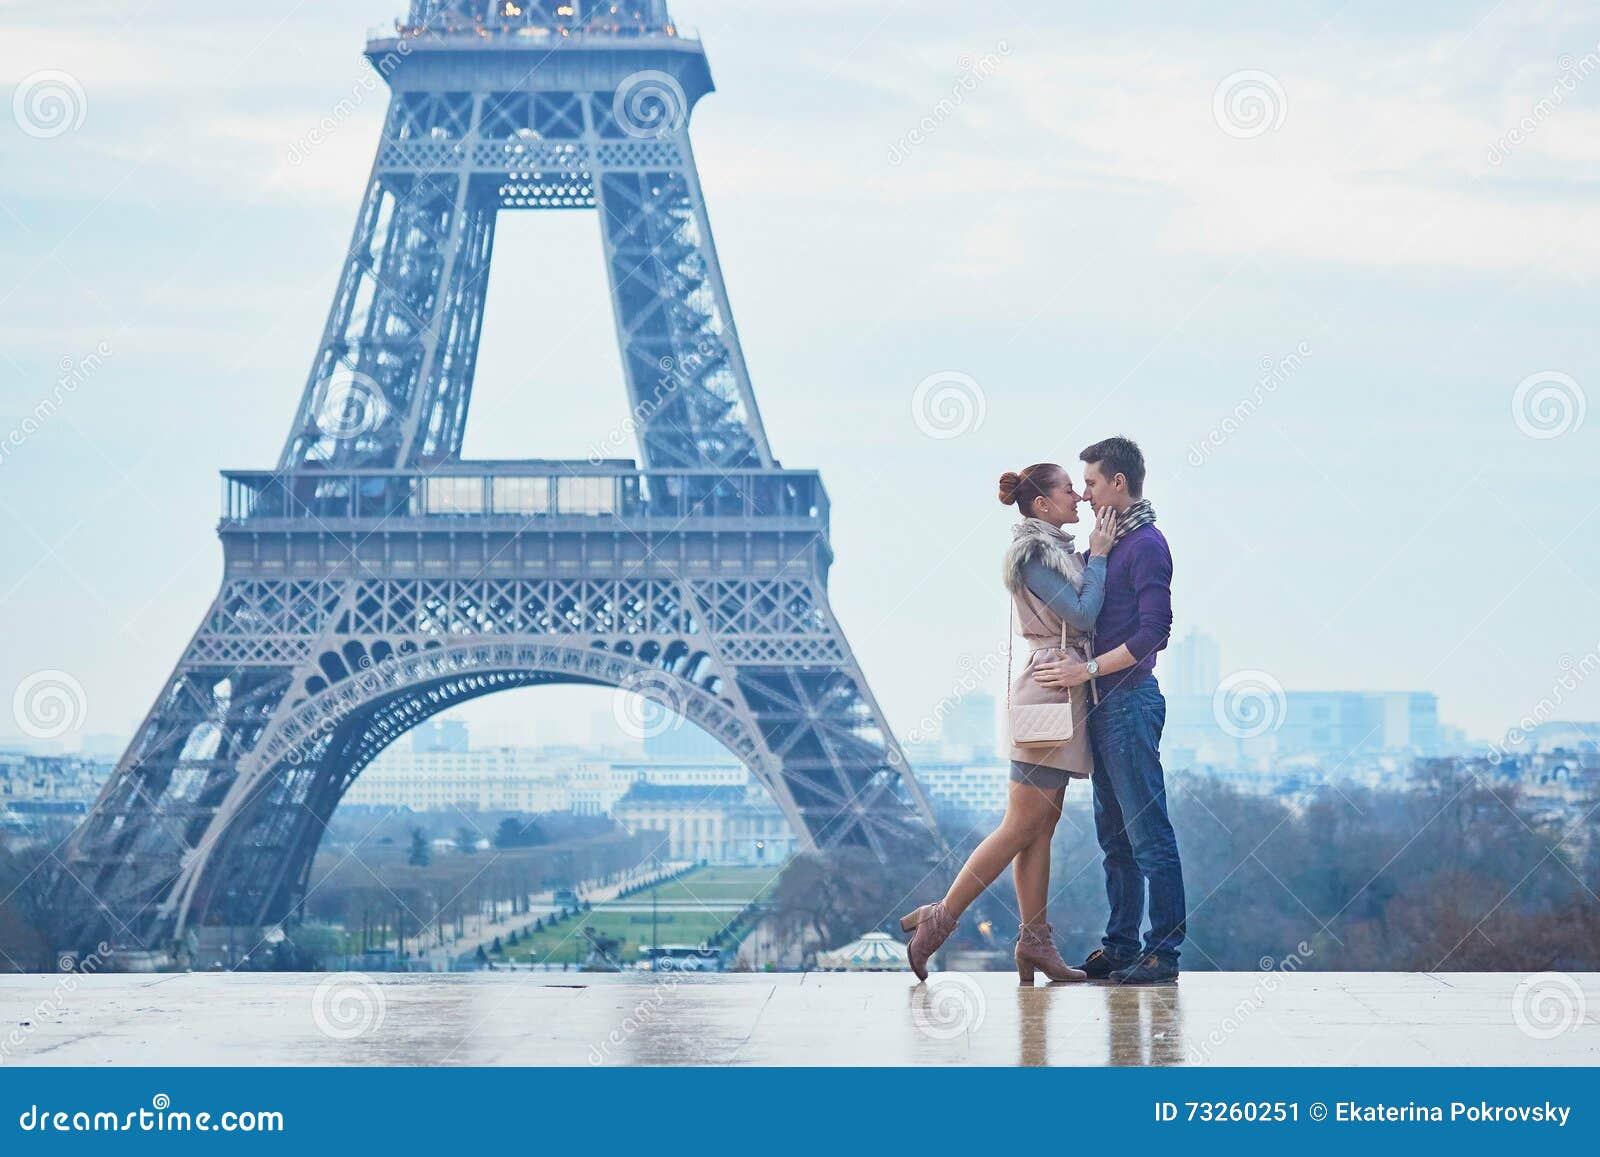 Romantische Paare nahe dem Eiffelturm in Paris, Frankreich